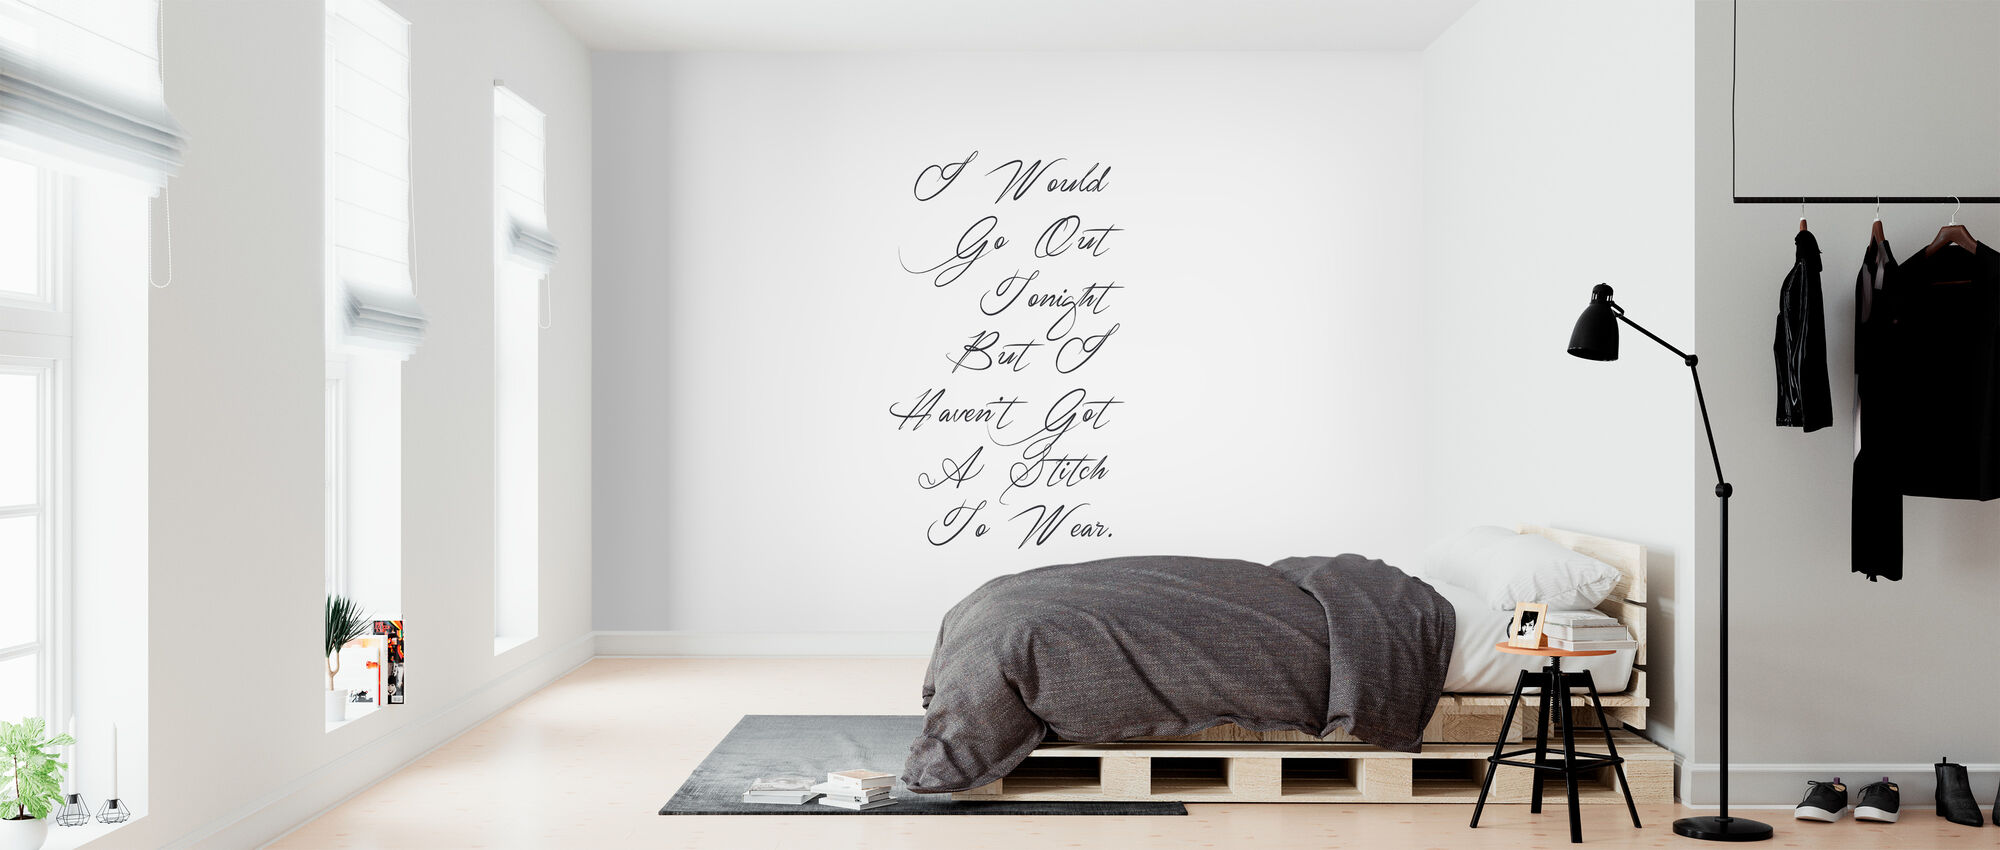 This Charming Man - Wallpaper - Bedroom